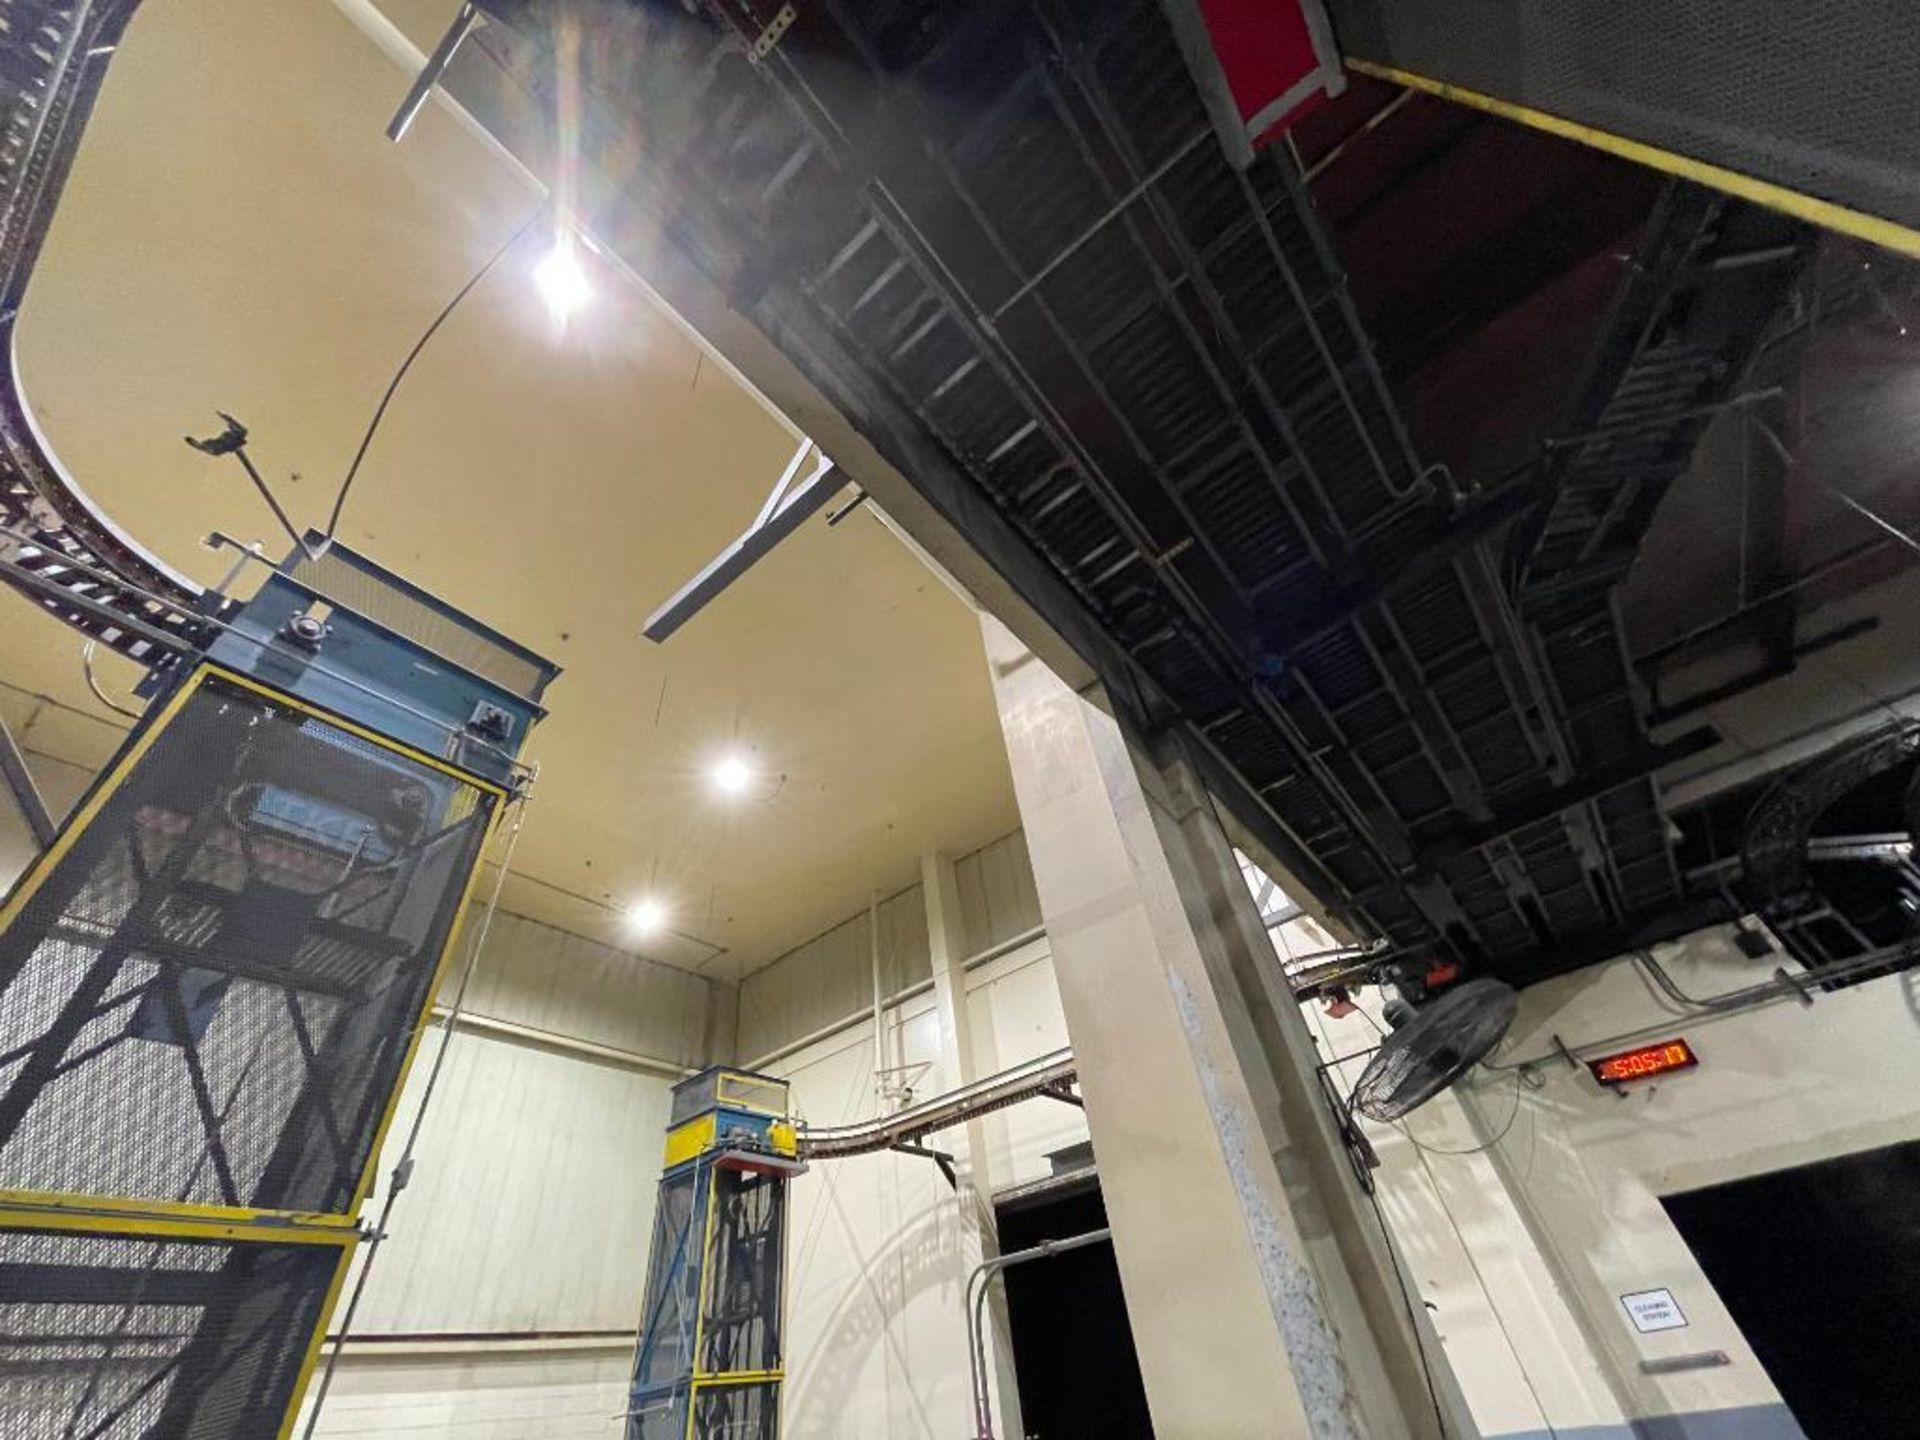 overhead power case conveyor - Image 3 of 5